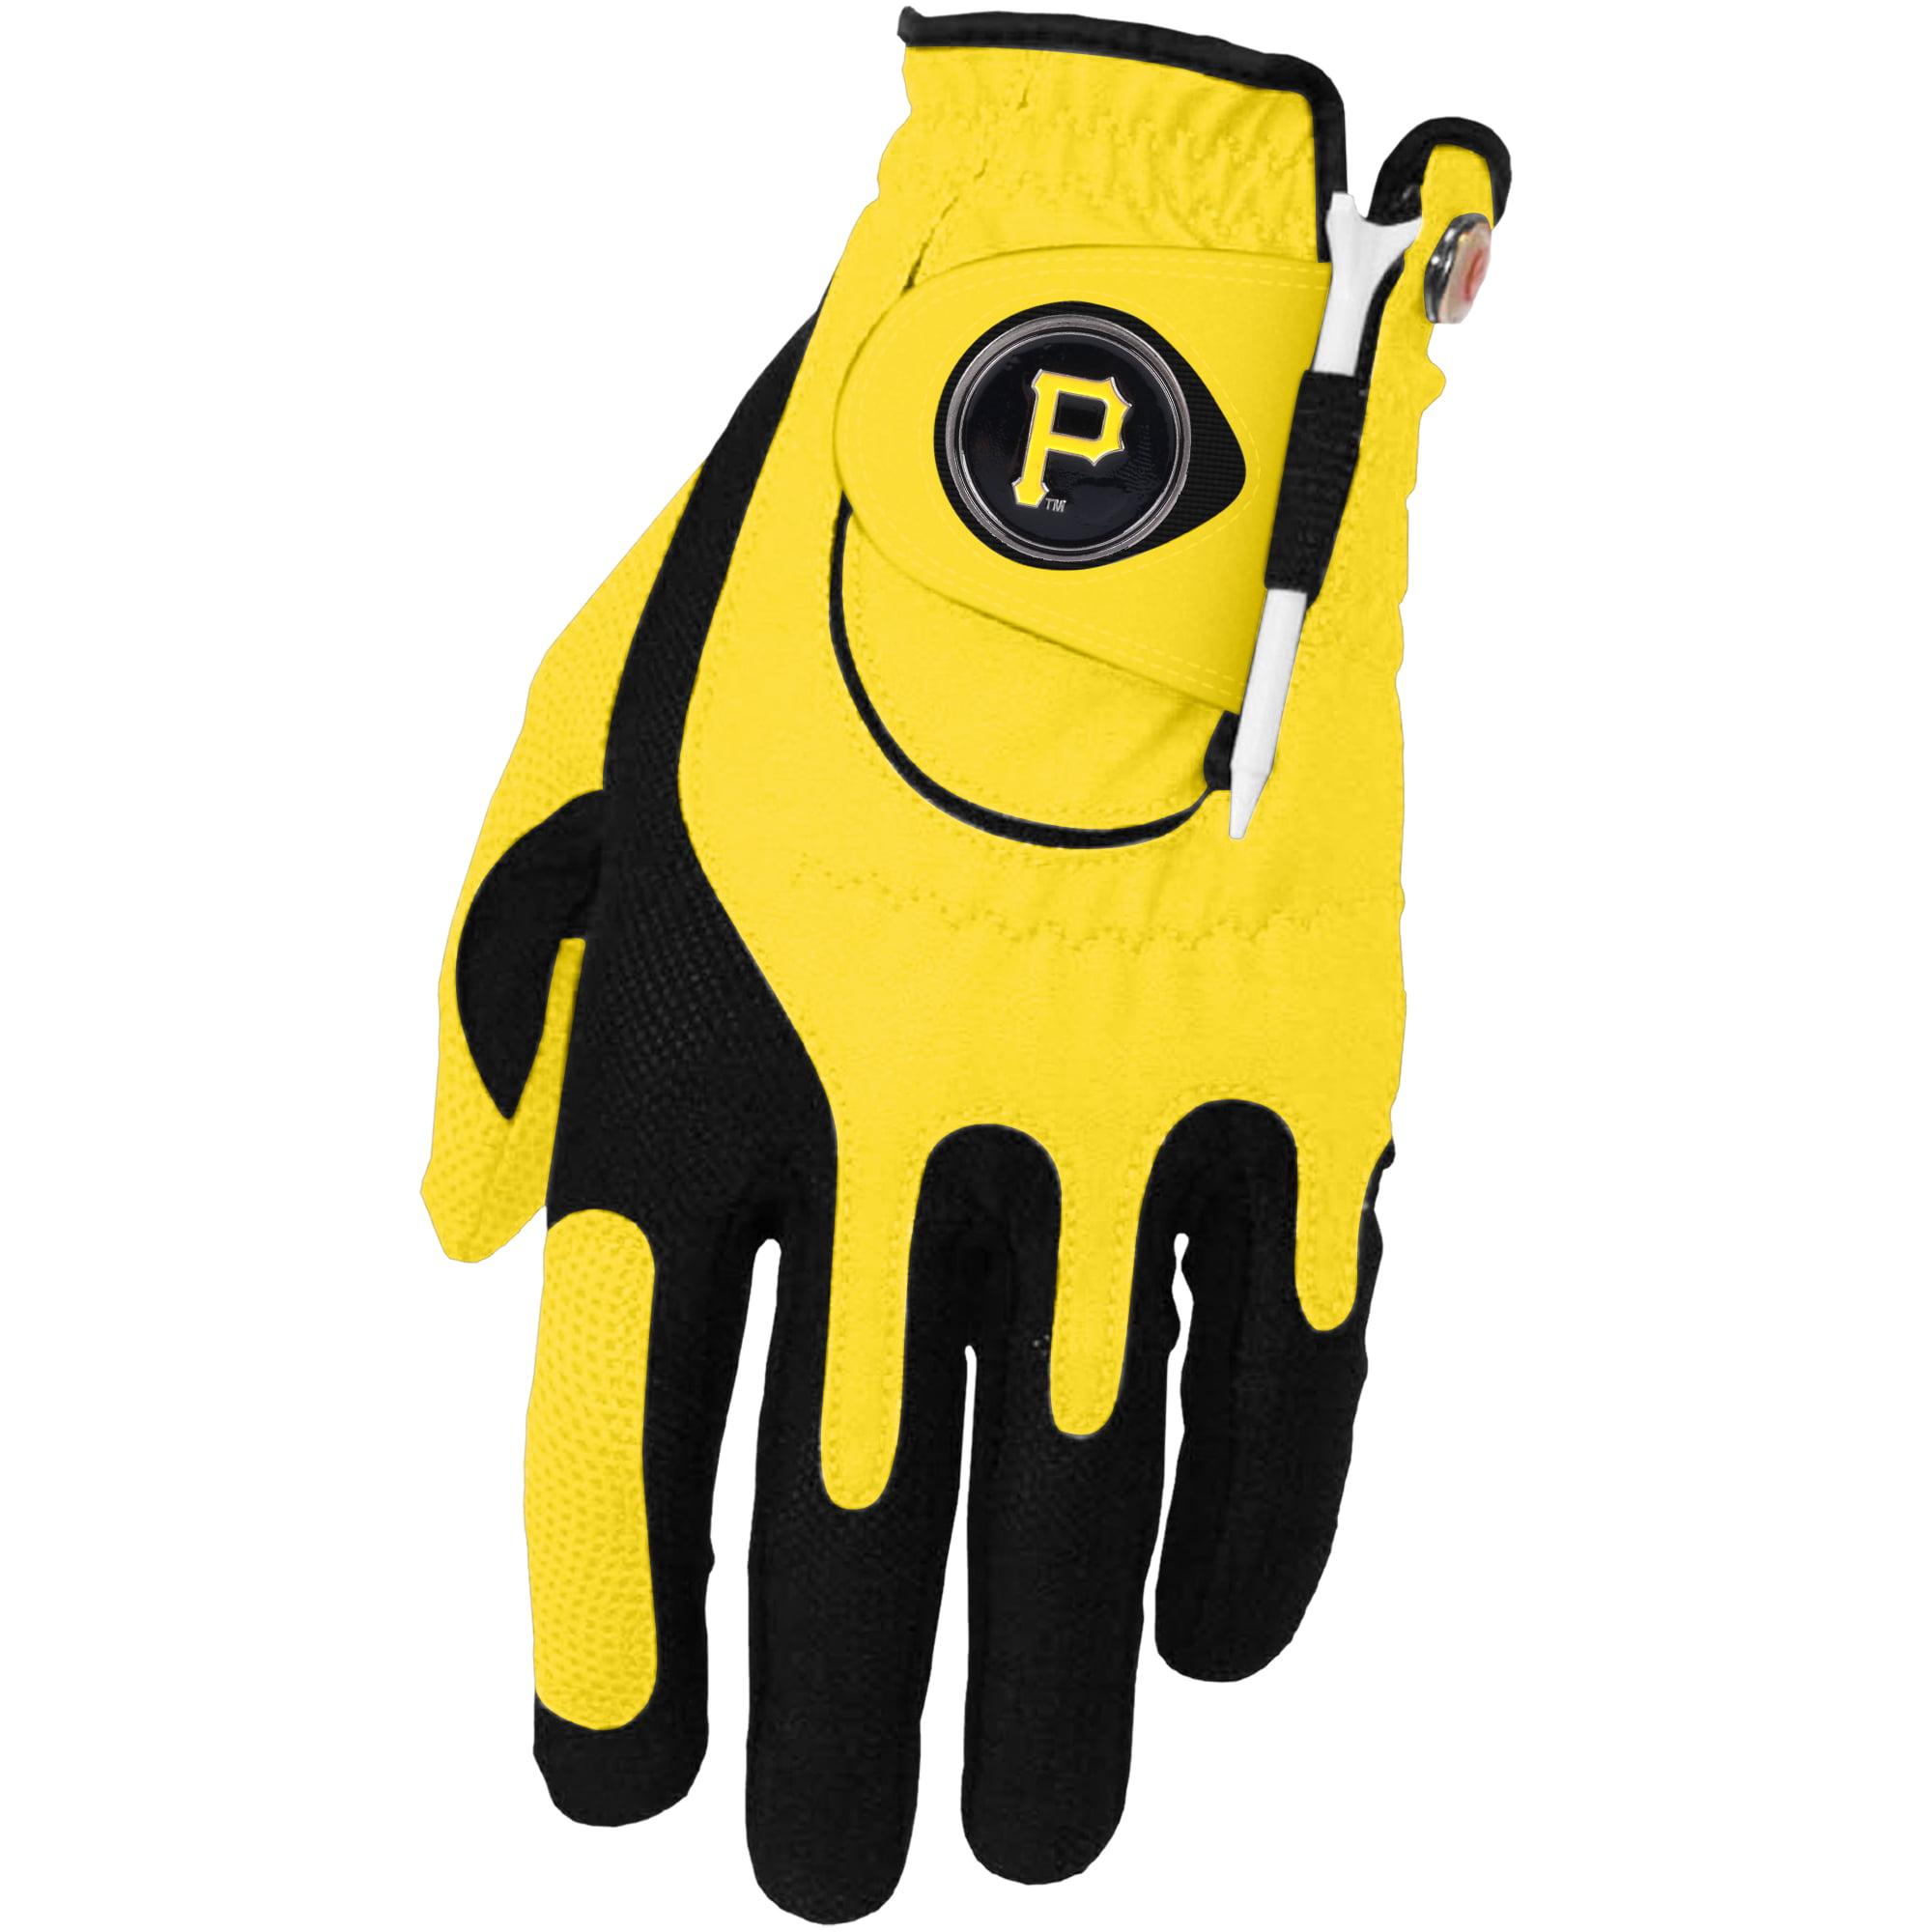 Pittsburgh Pirates Left Hand Golf Glove & Ball Marker Set - Yellow - OSFM